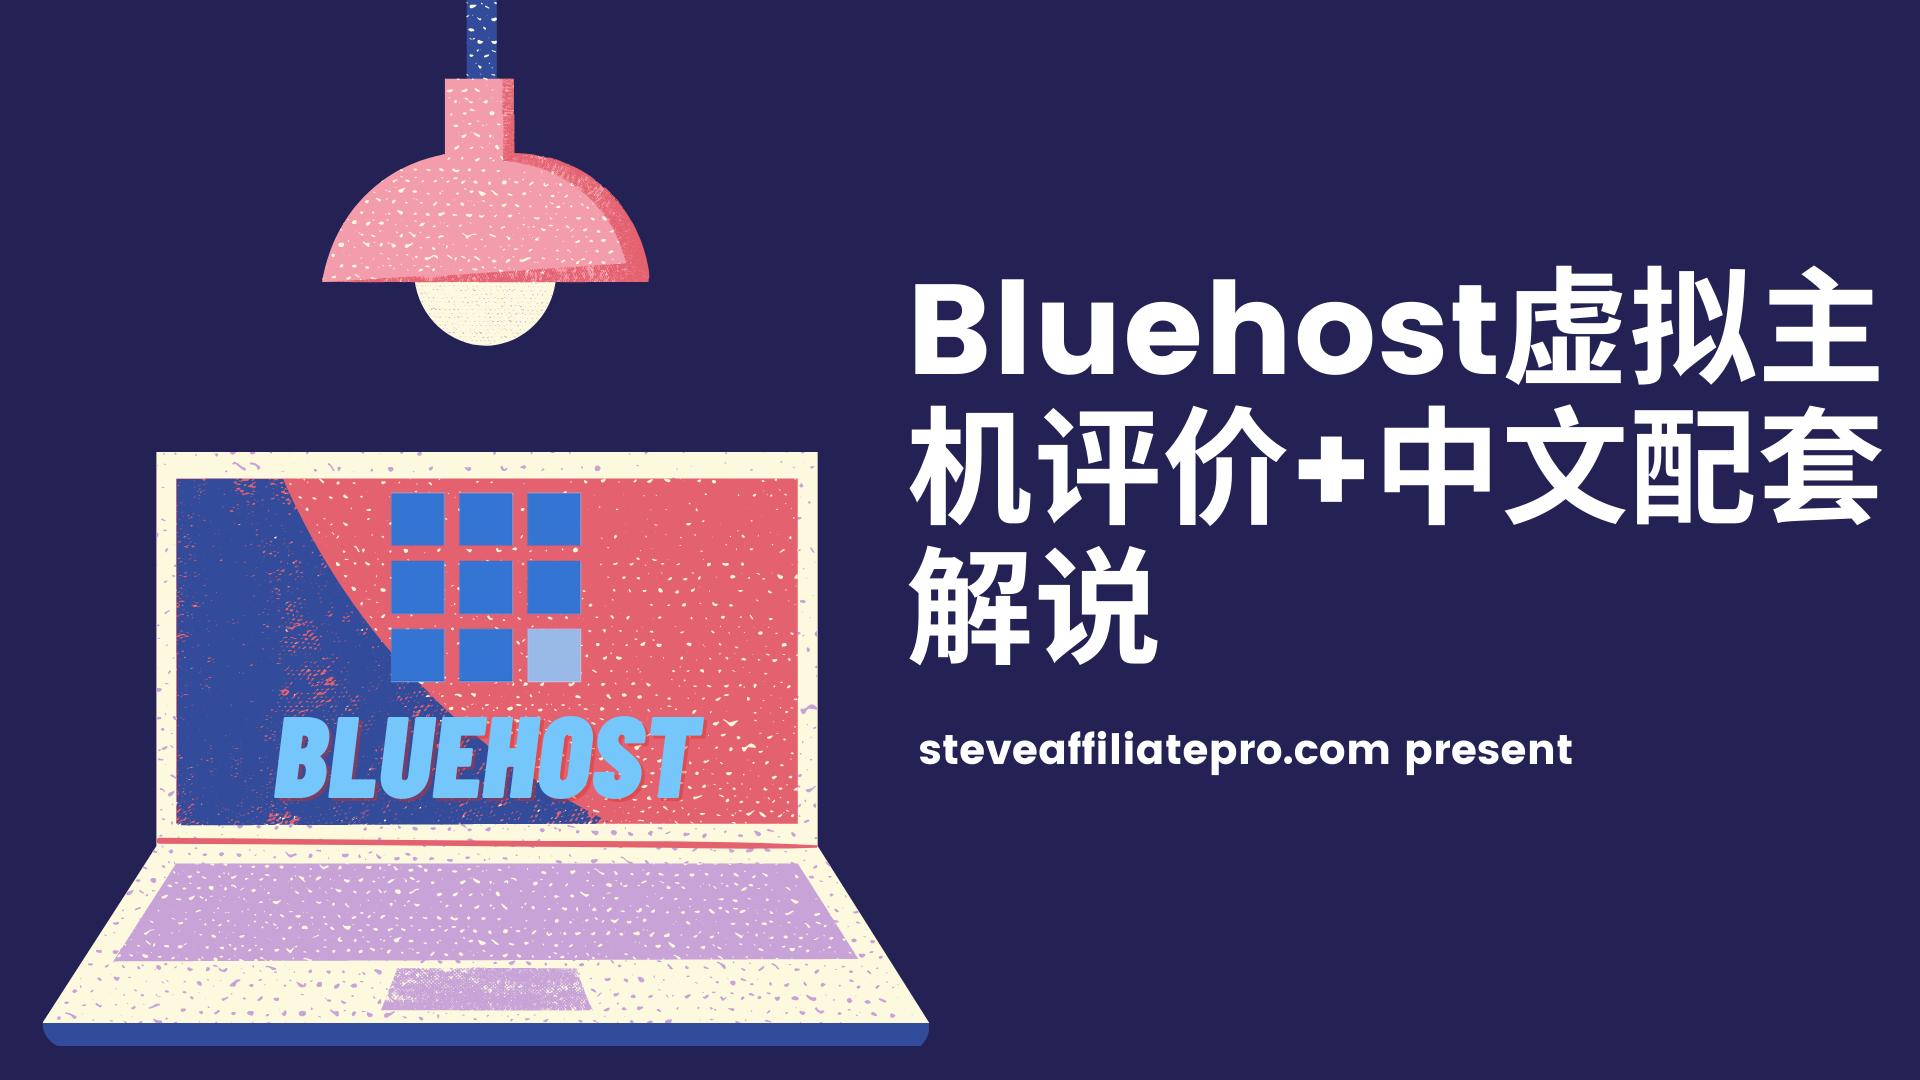 bluehost虚拟主机评价,好用吗?